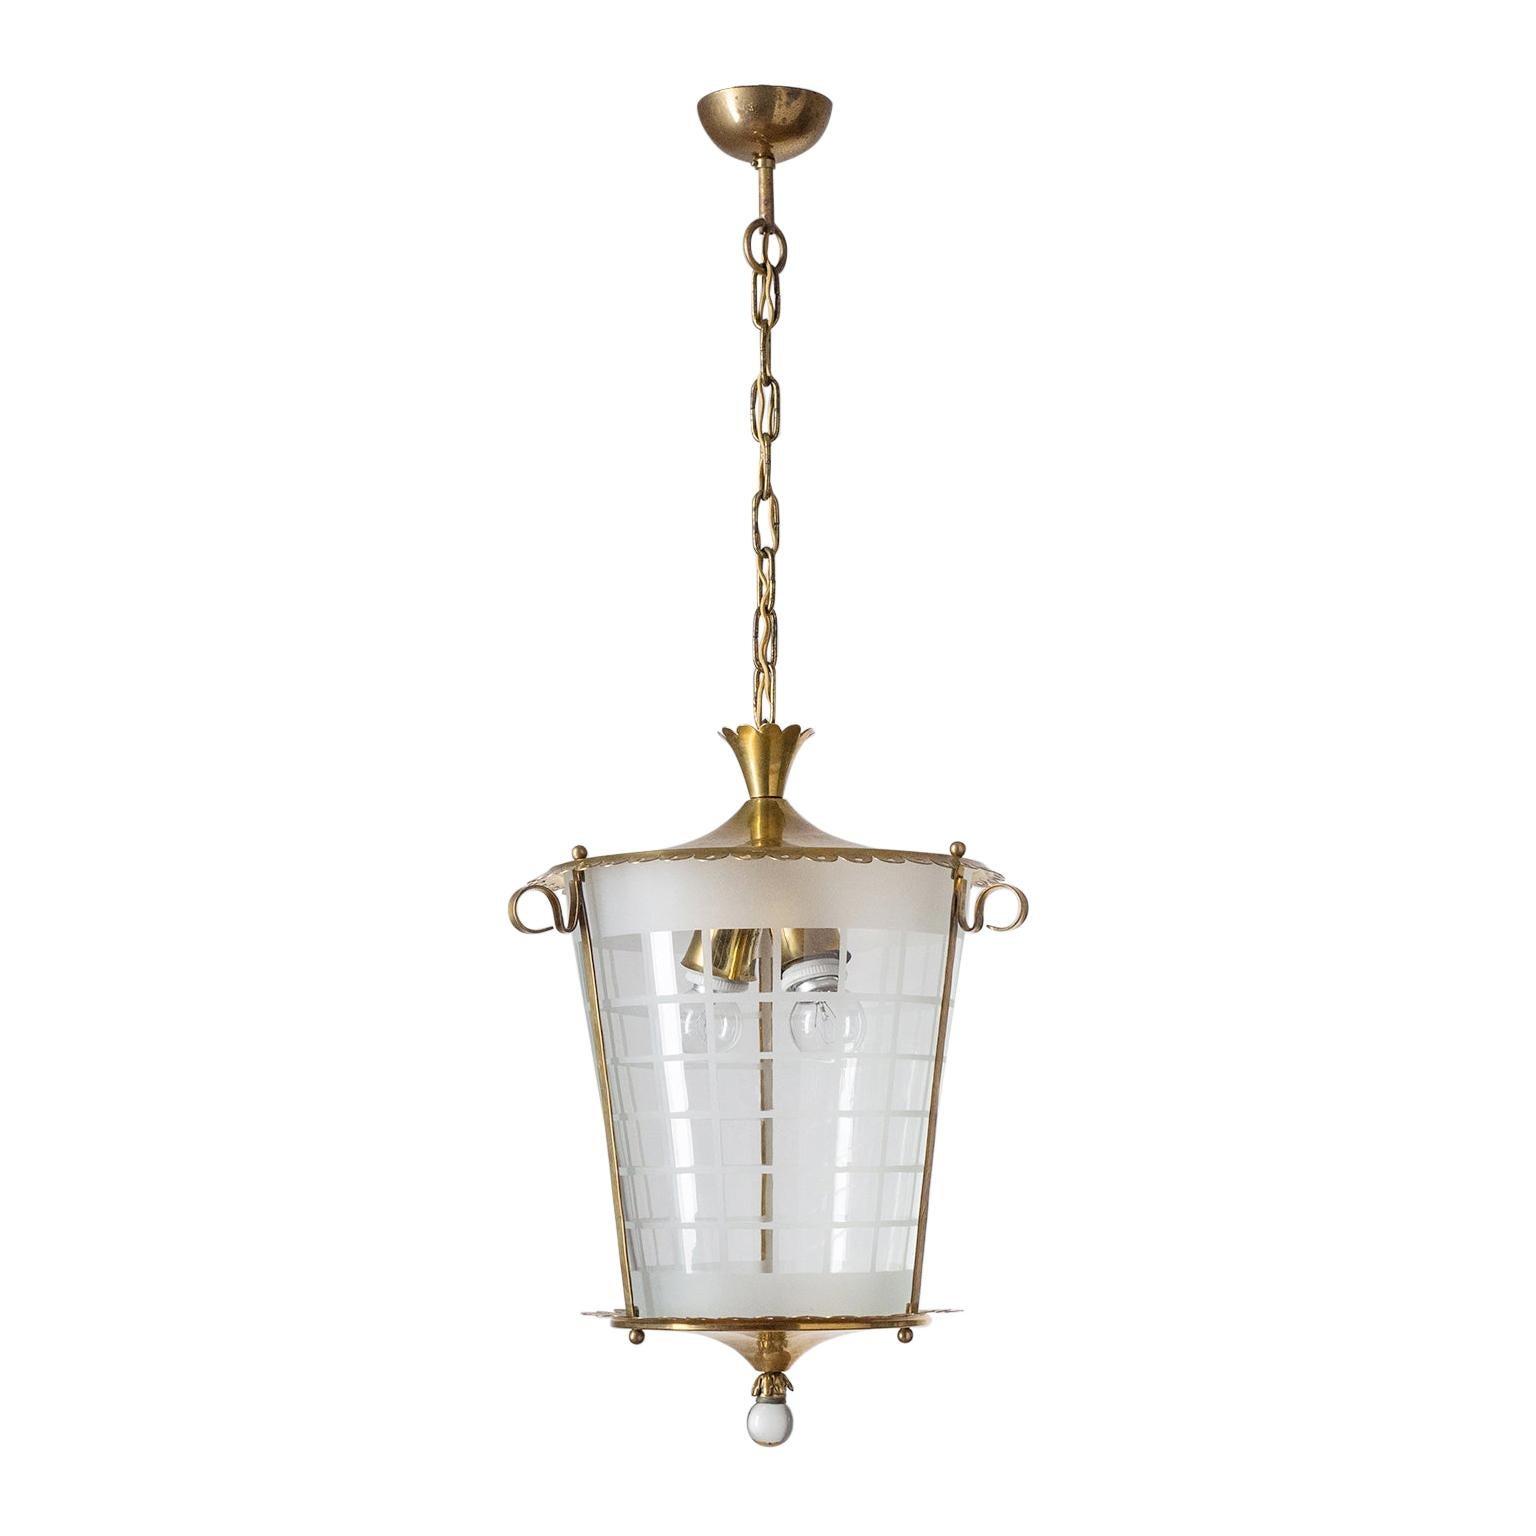 Italian Lantern, 1930s, Brass and Glass